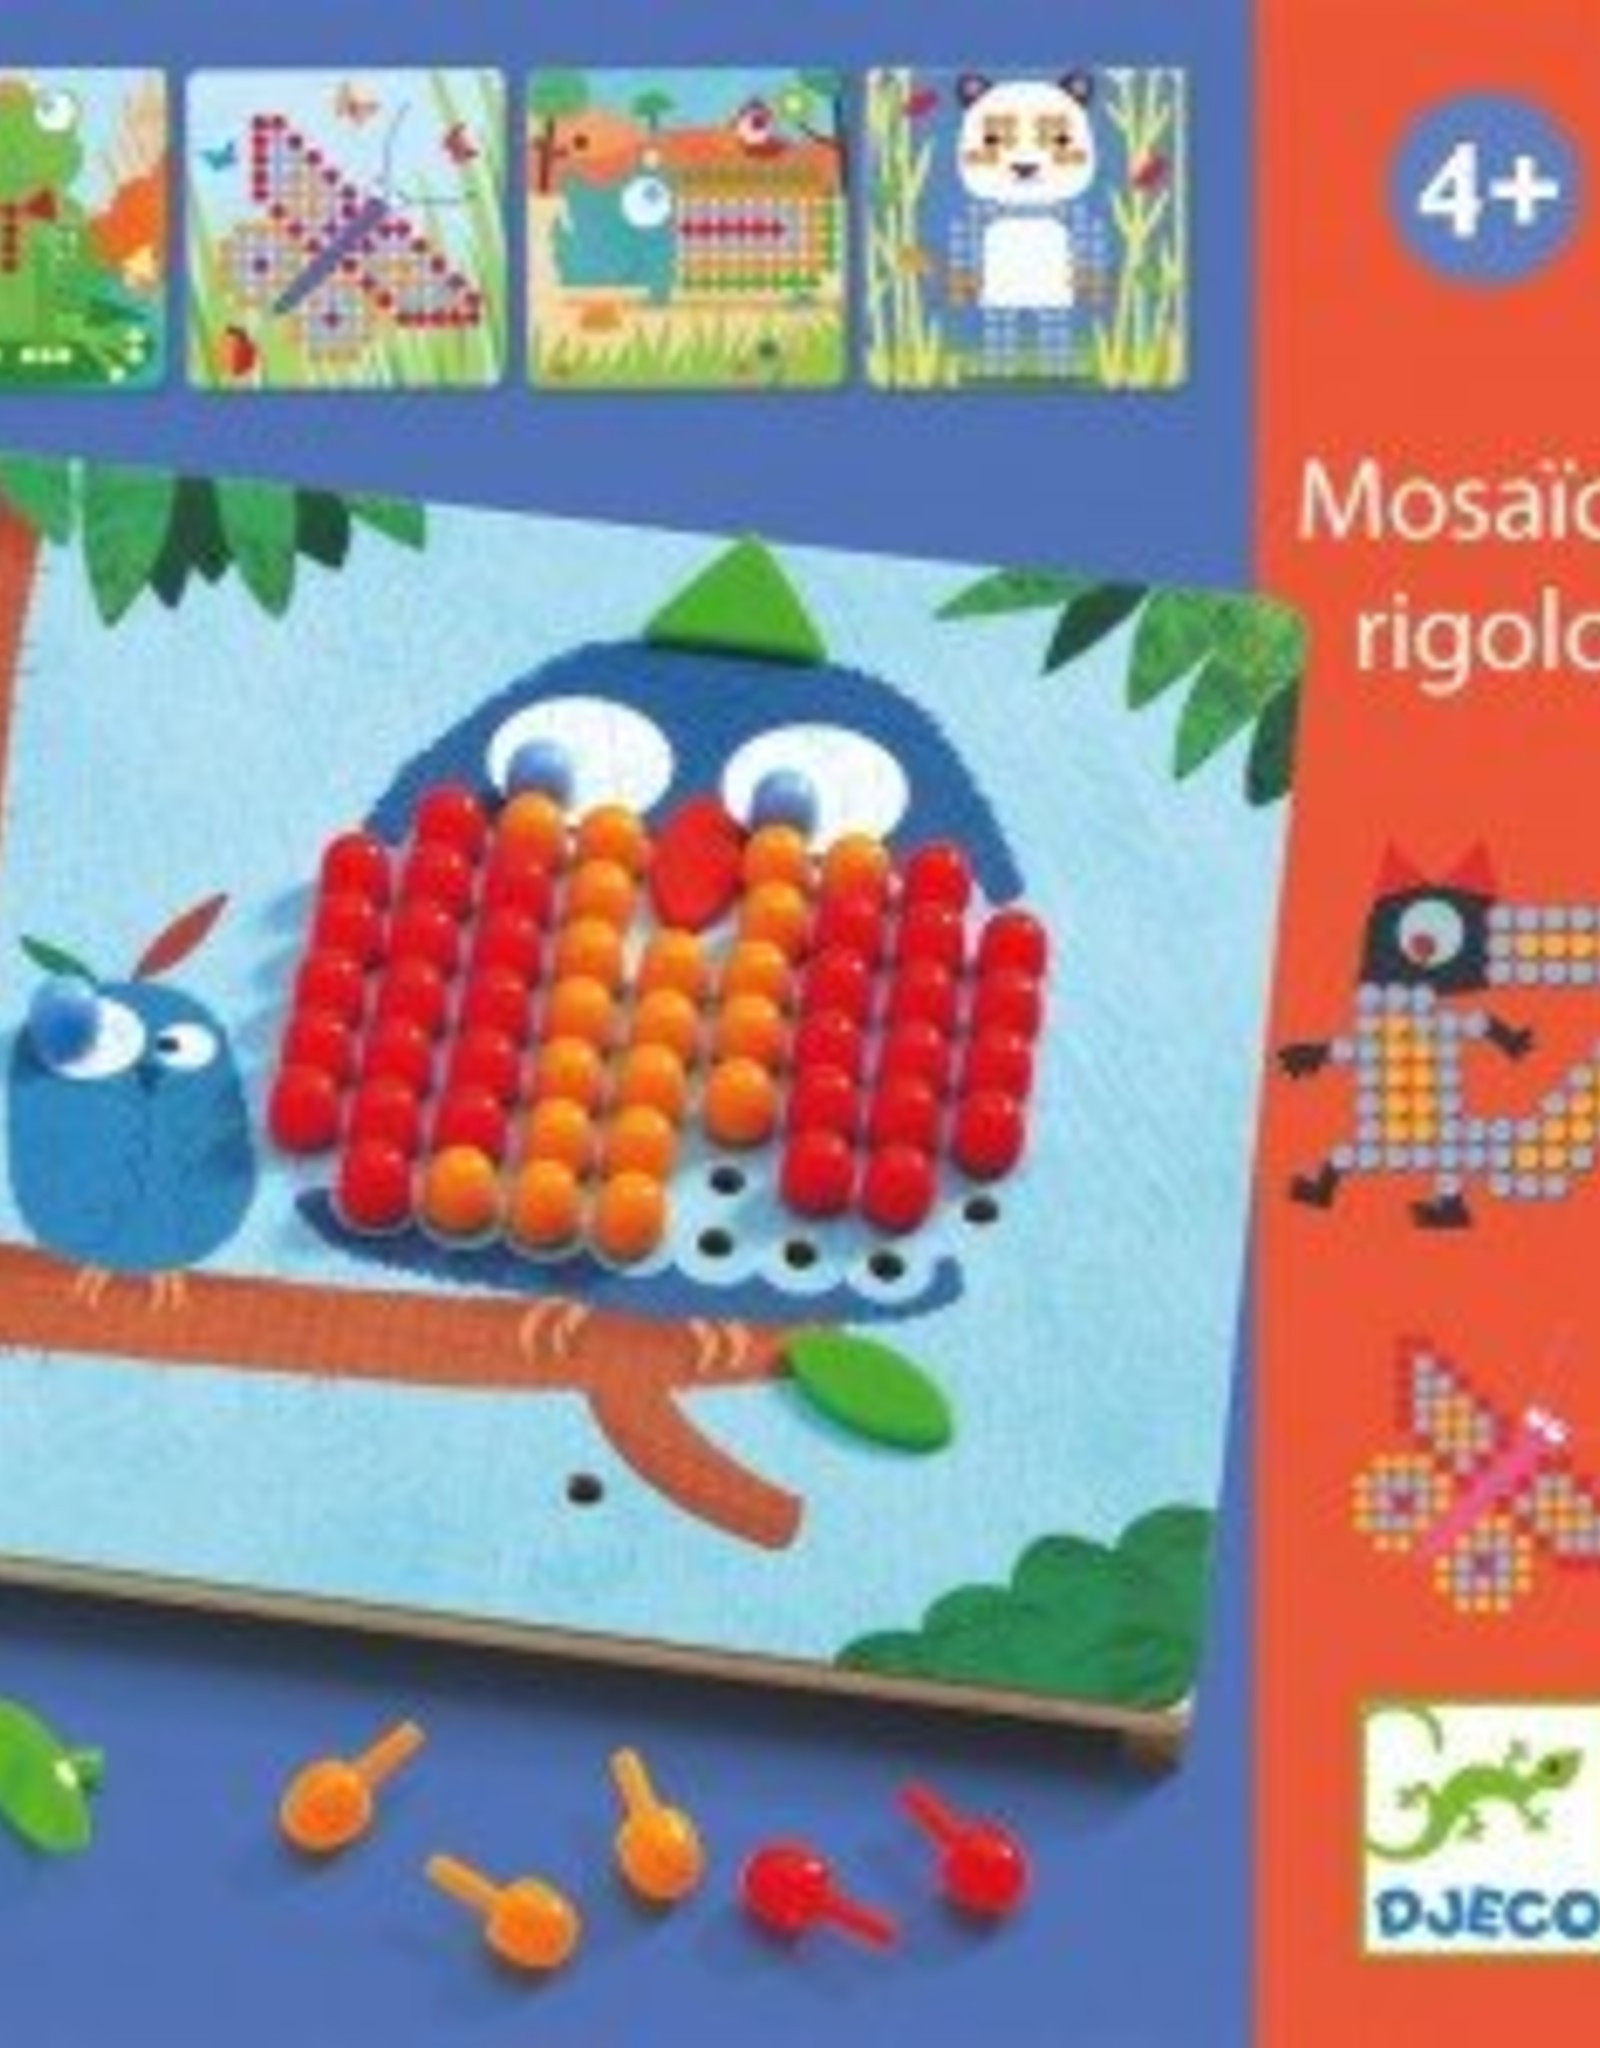 Djeco Mosaico Rigolo